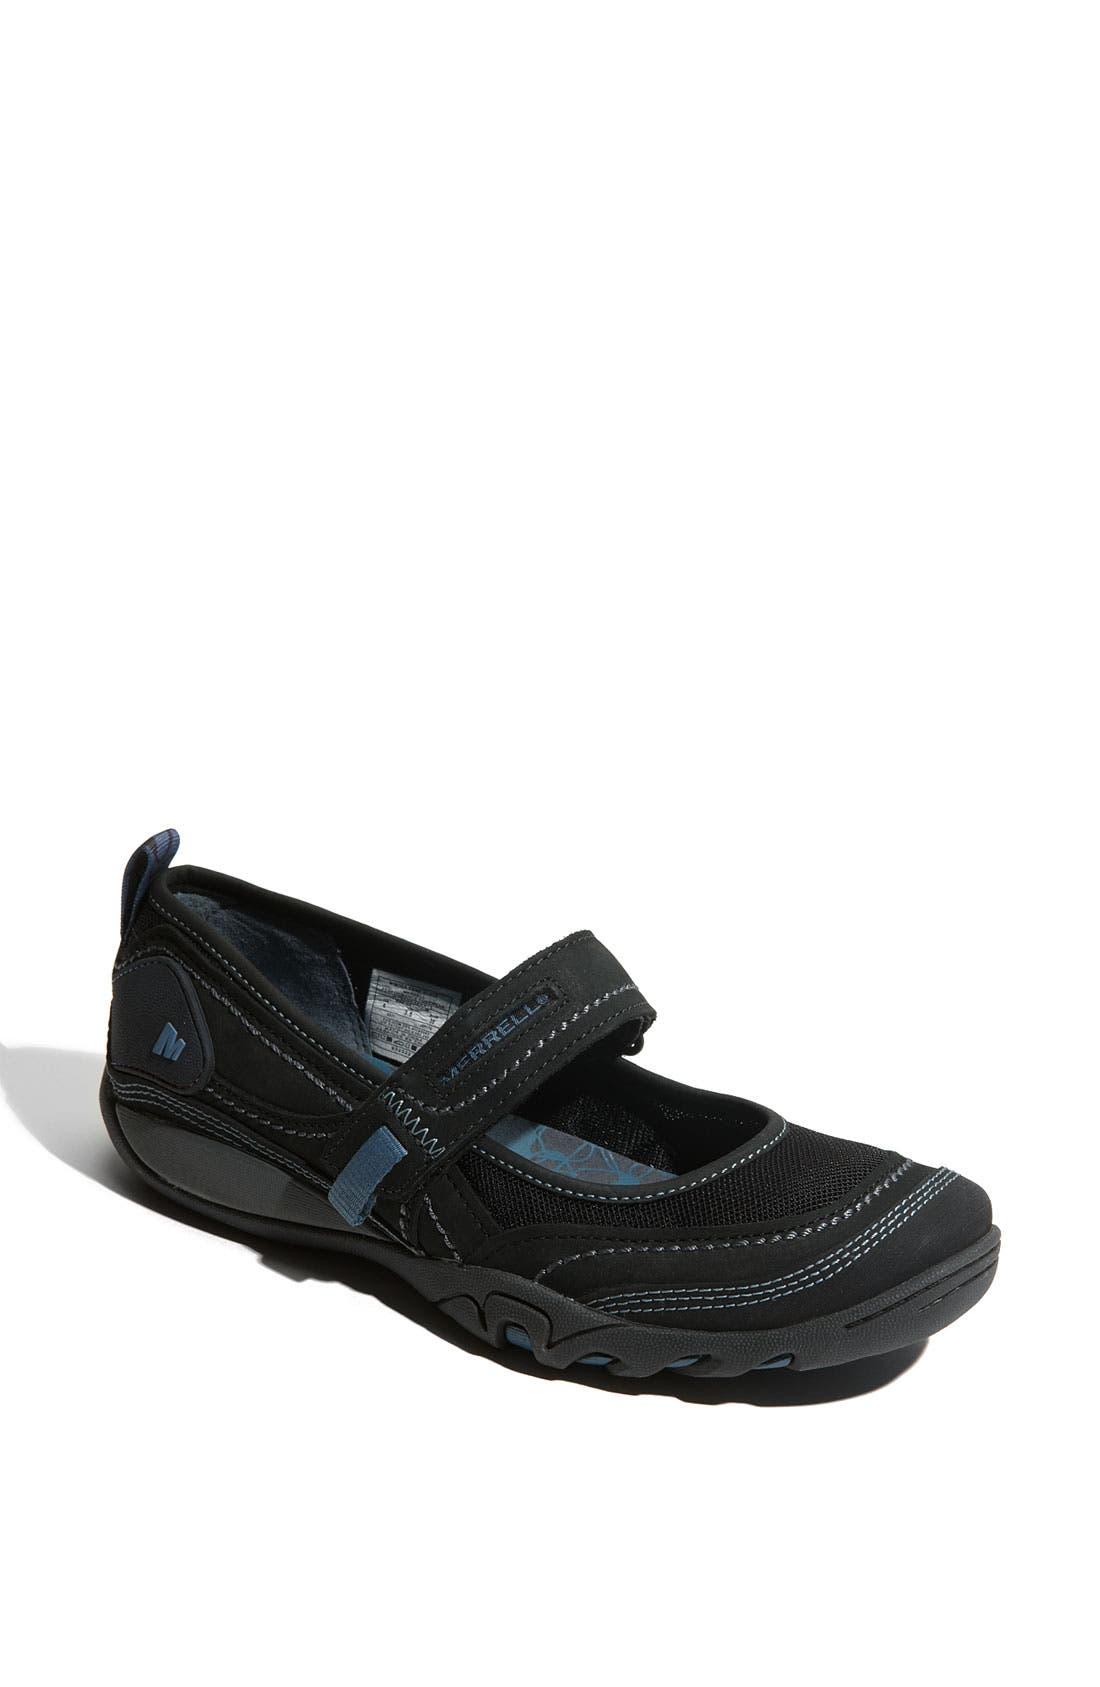 Main Image - Merrell 'Mimosa' Sneaker